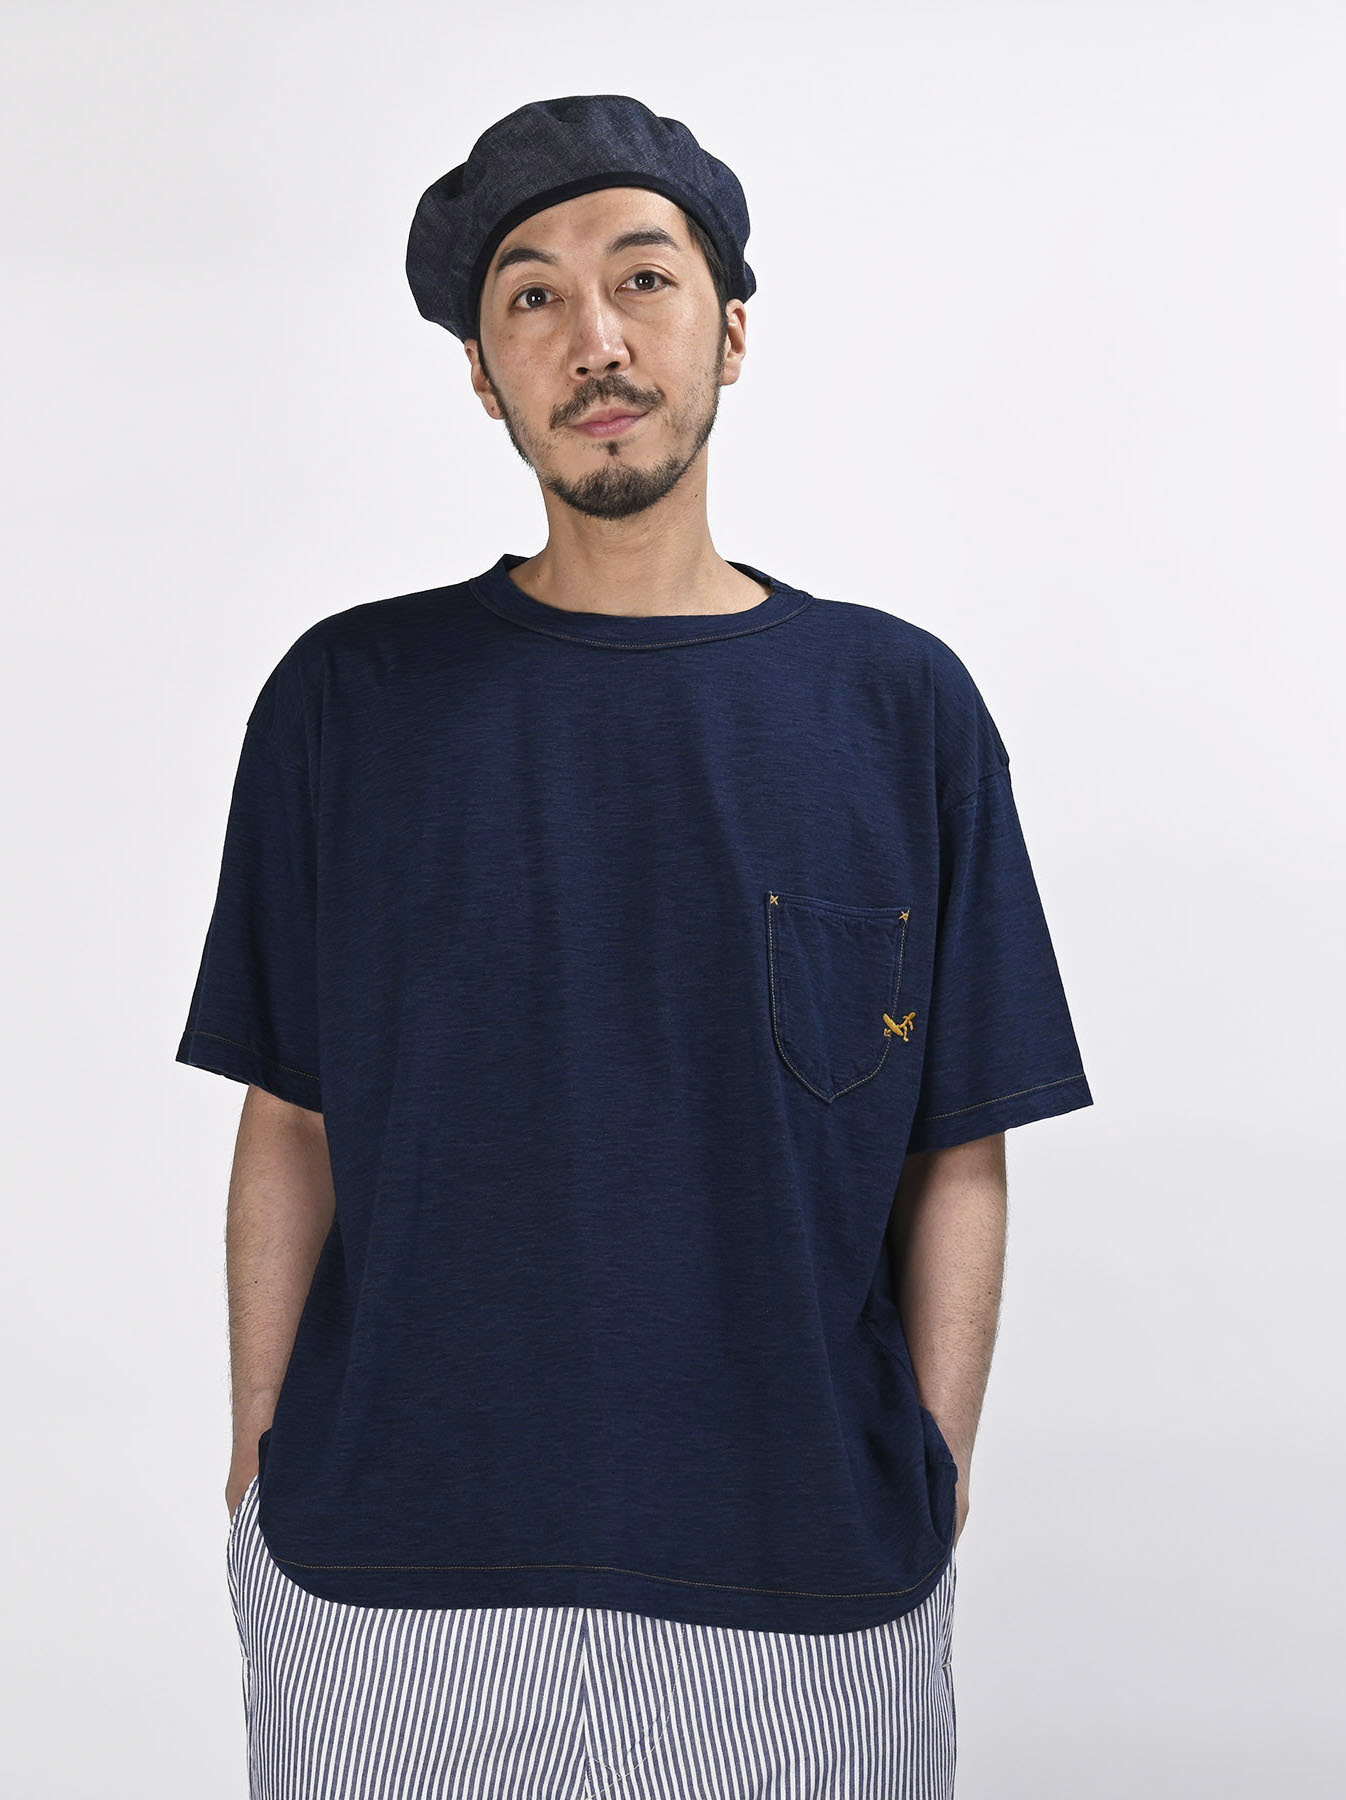 Indigo Hayama-kun Embroidered 908 Ocean T-shirt (0621)-3